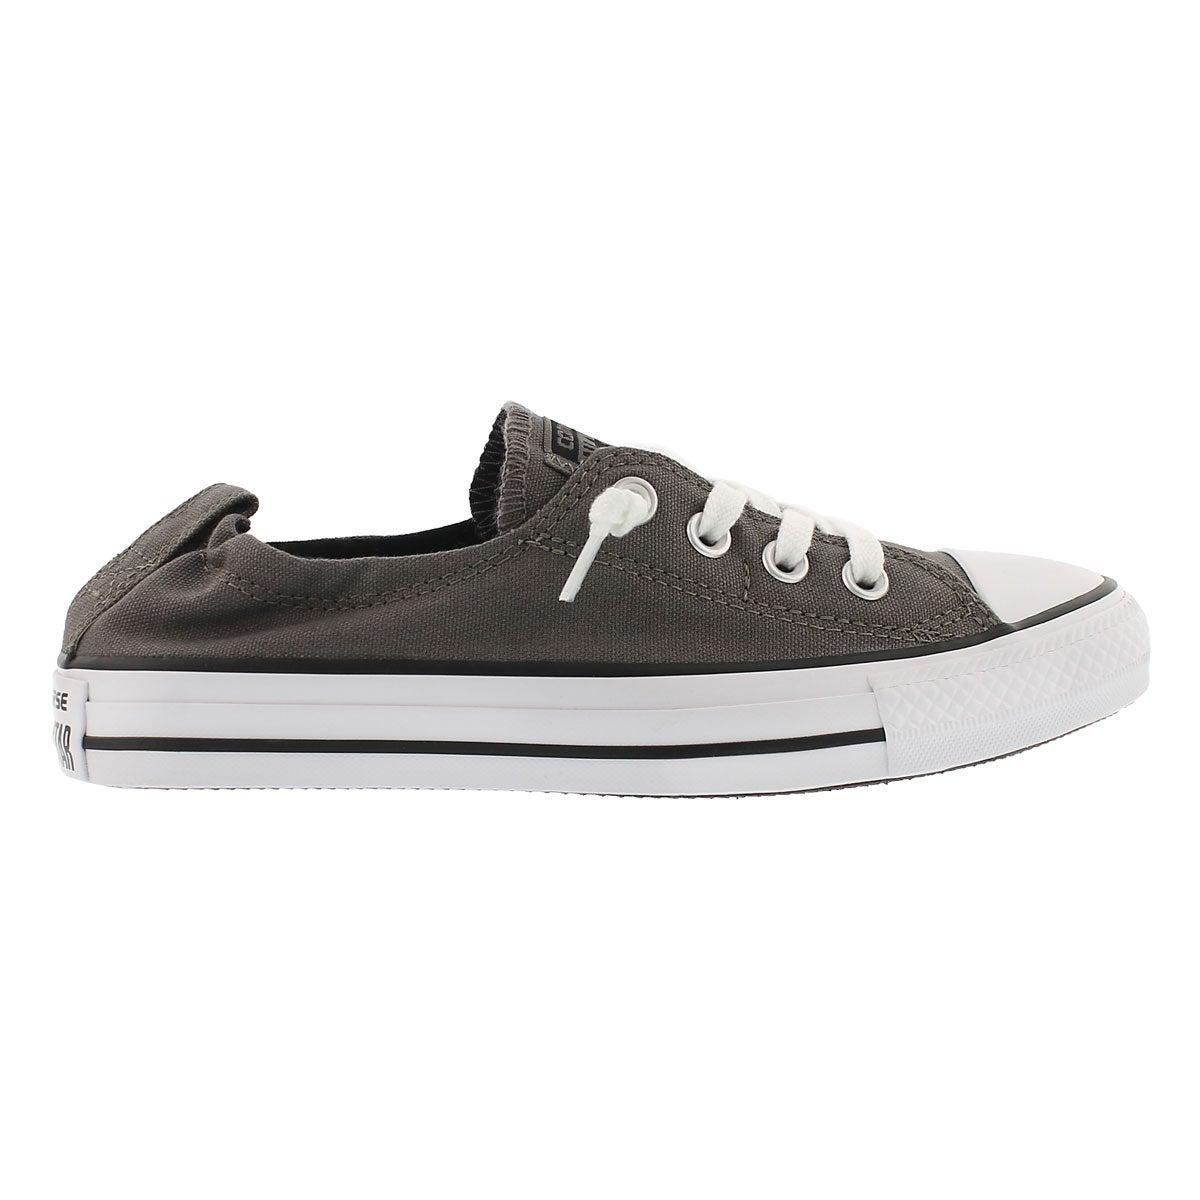 Lds CT A/S Shoreline grey sneaker